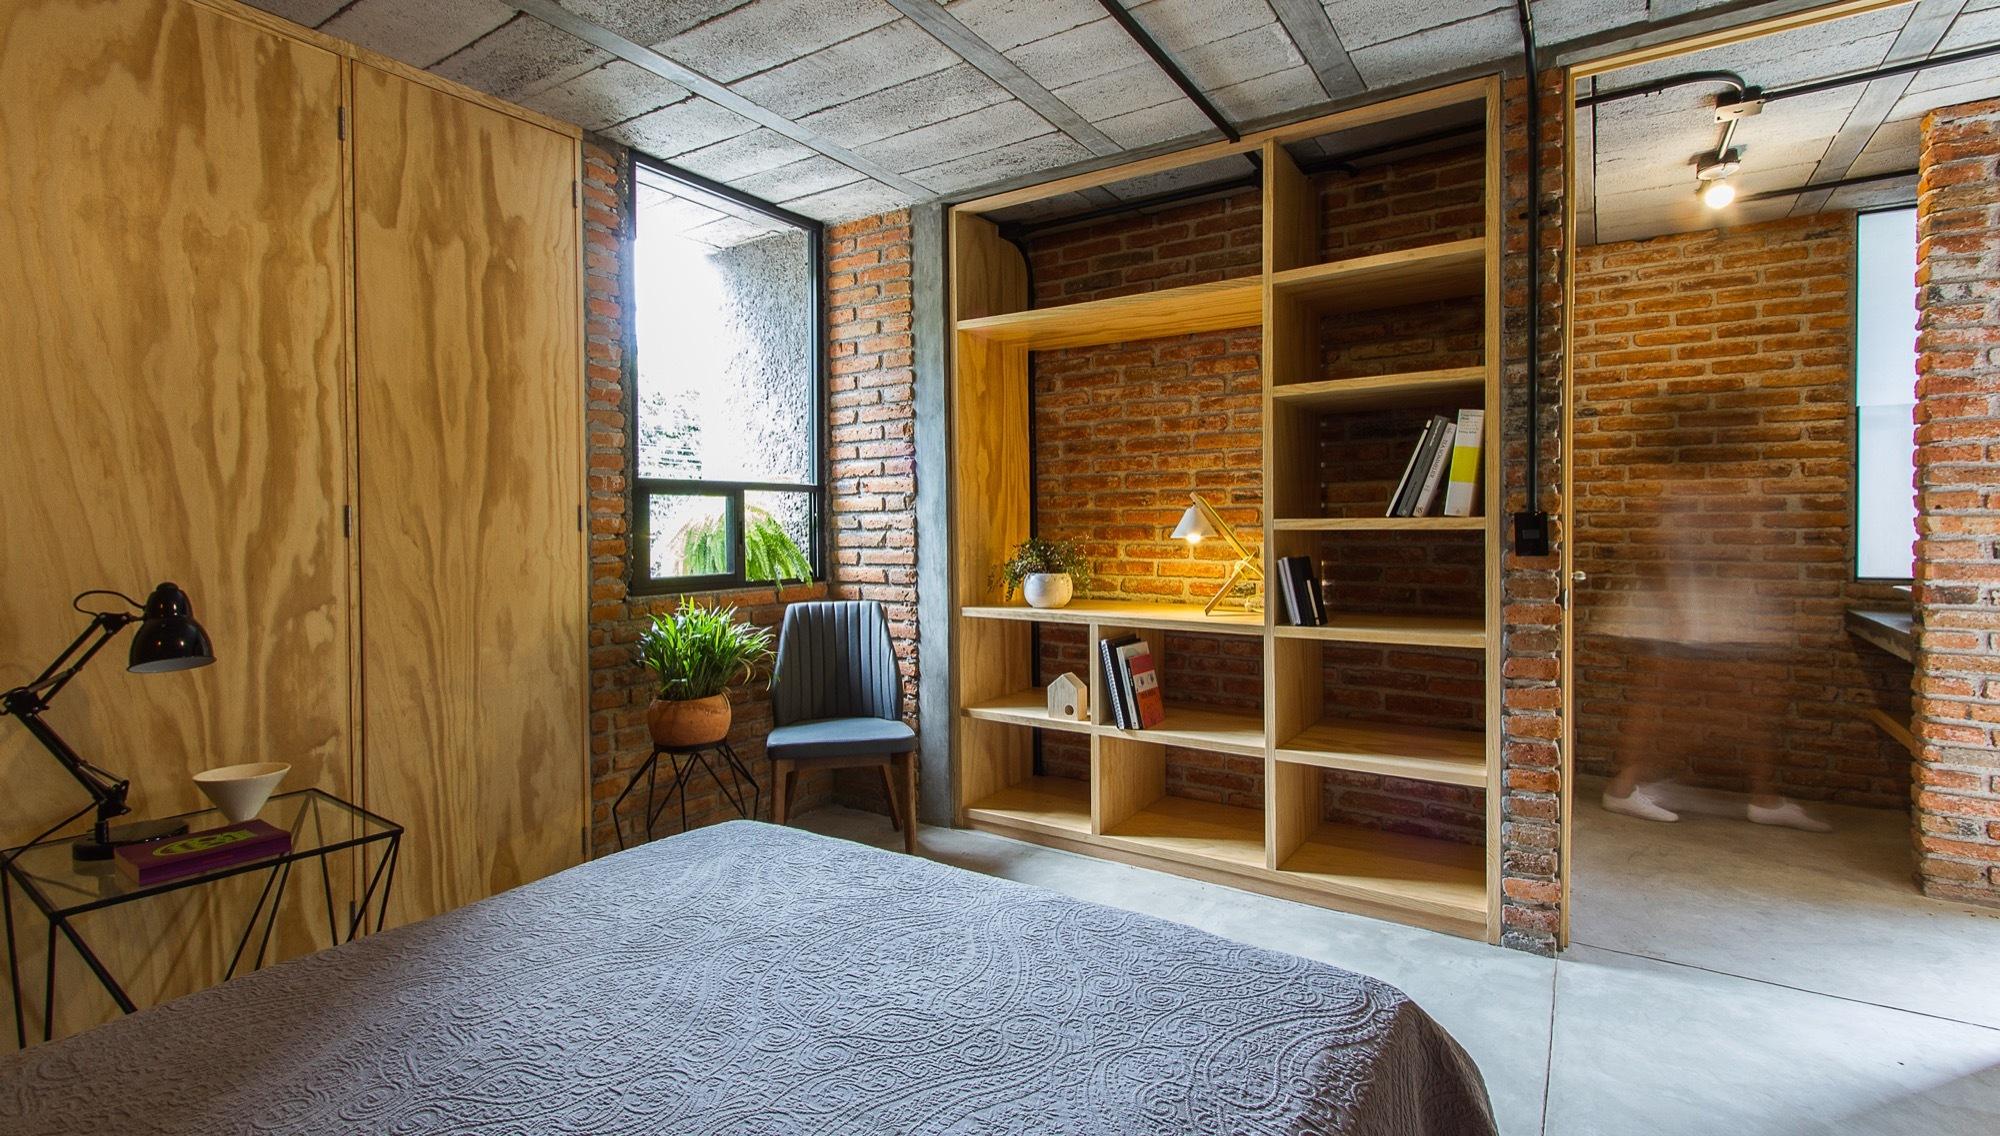 Galer a de casa estudio intersticial arquitectura 9 for Casa estudio arquitectura